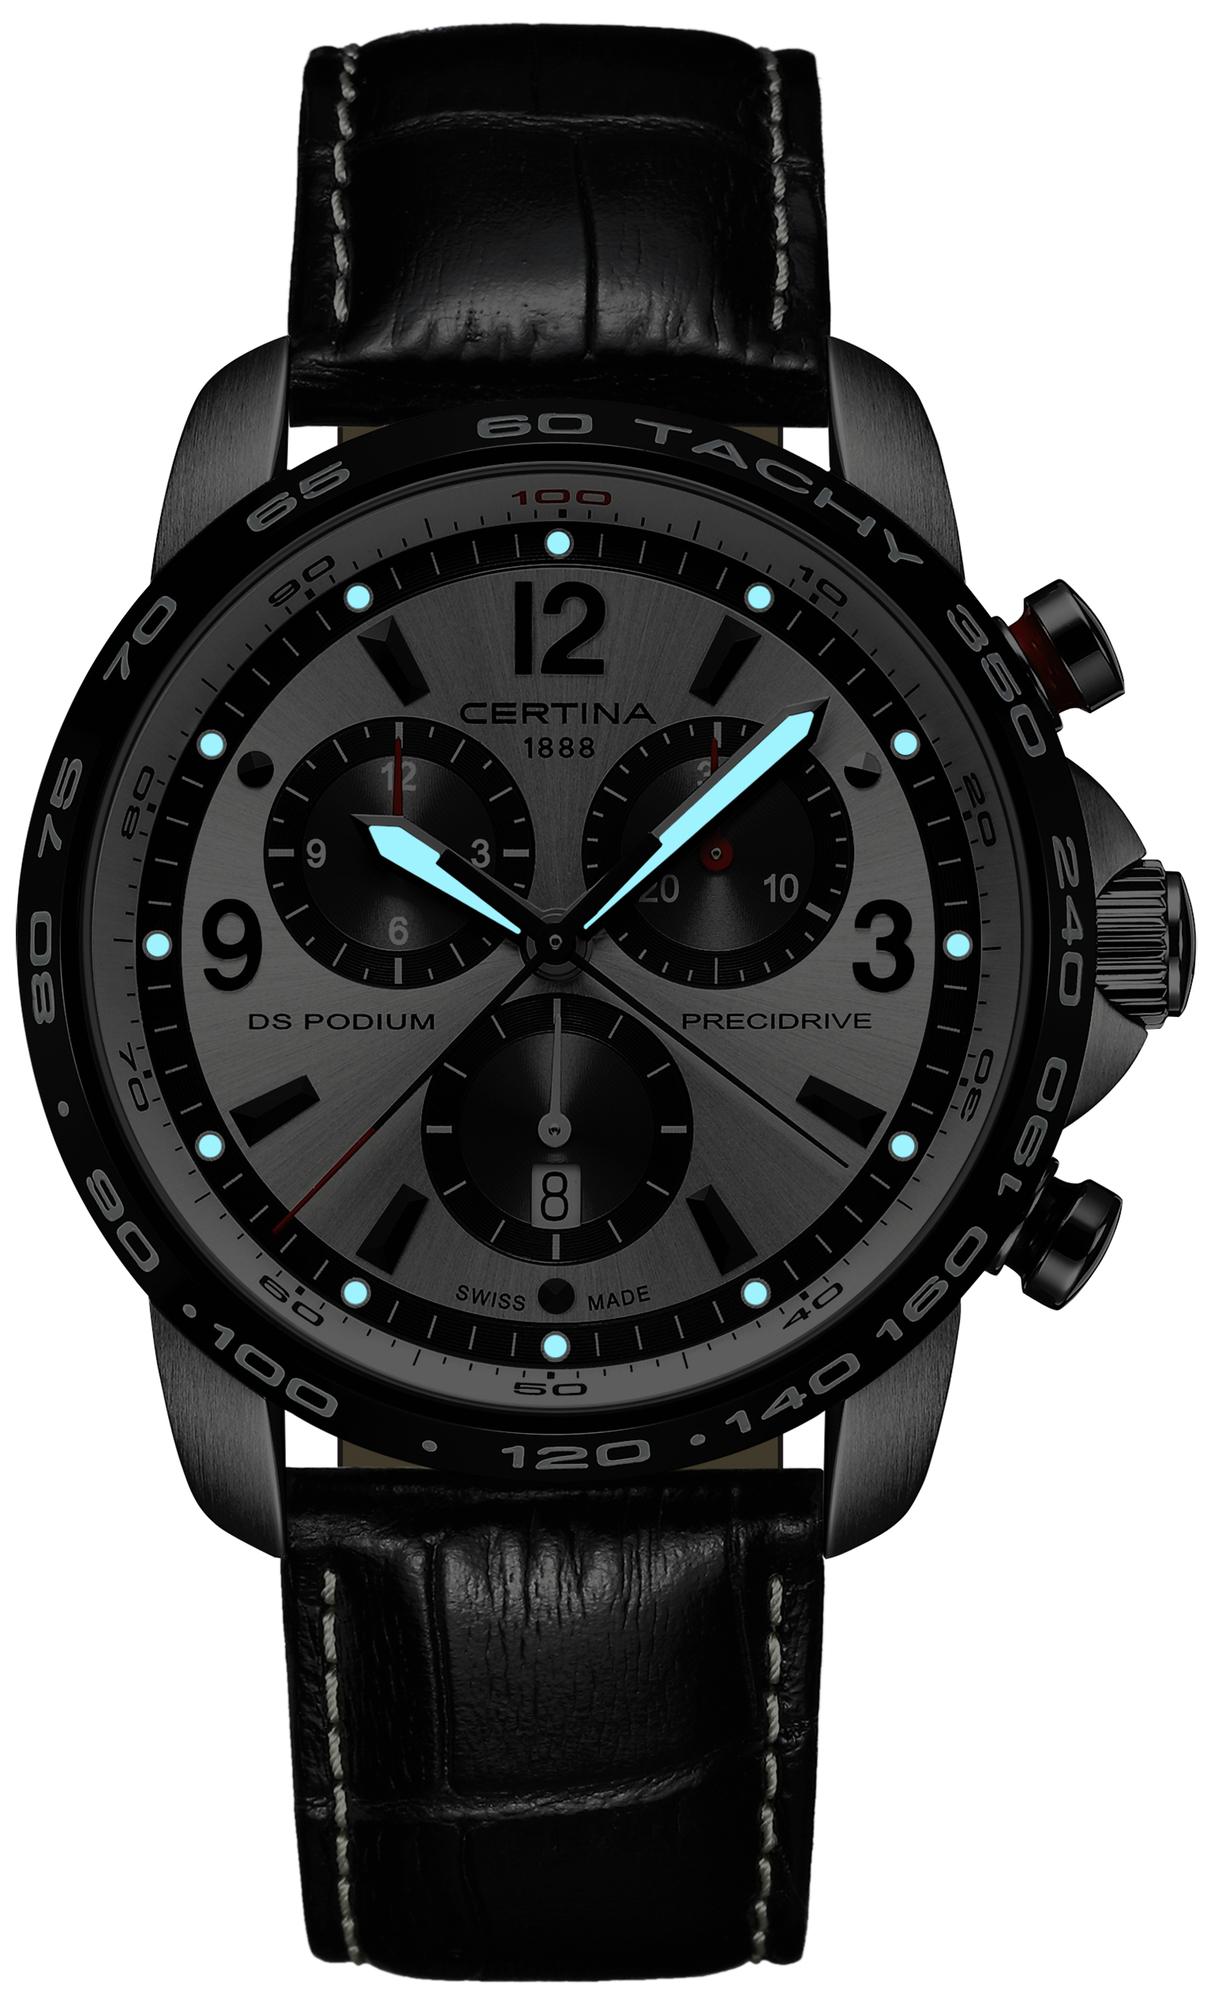 zegarek Certina C001.647.16.037.00 DS Podium Chronograph 1/100 sec męski z tachometr DS Podium